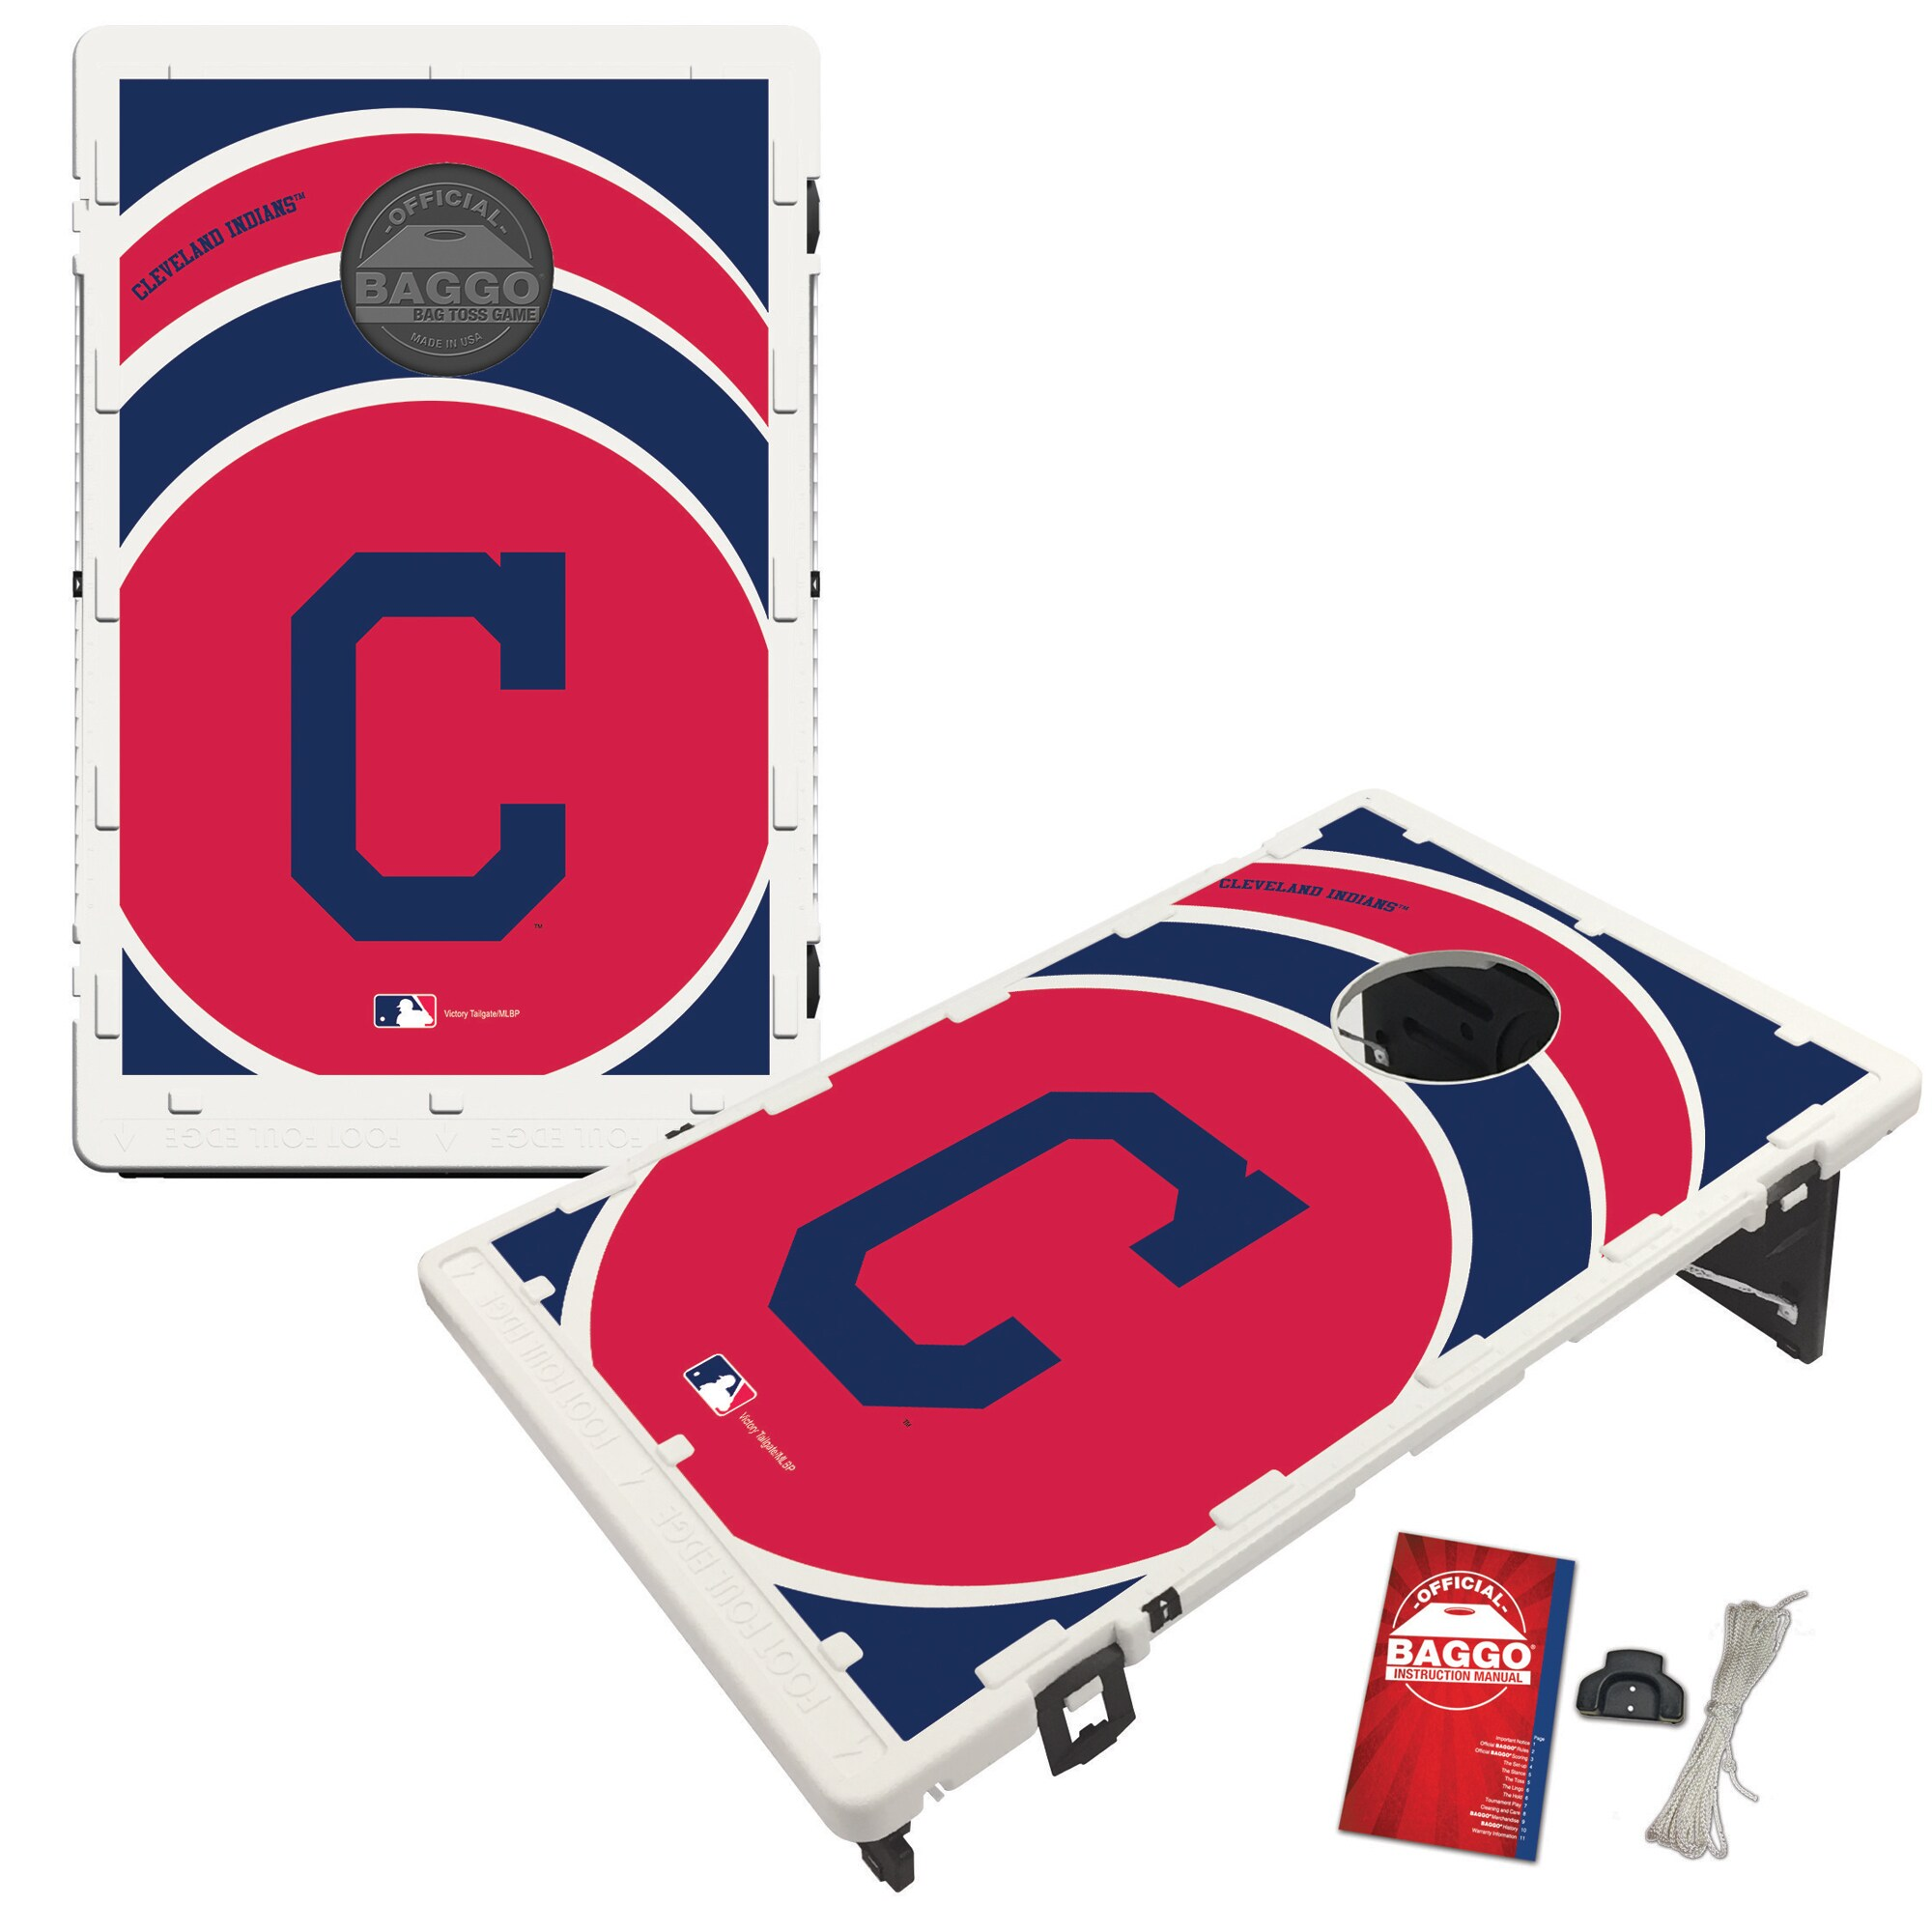 Cleveland Indians 2' x 3' BAGGO Vortex Cornhole Board Tailgate Toss Set